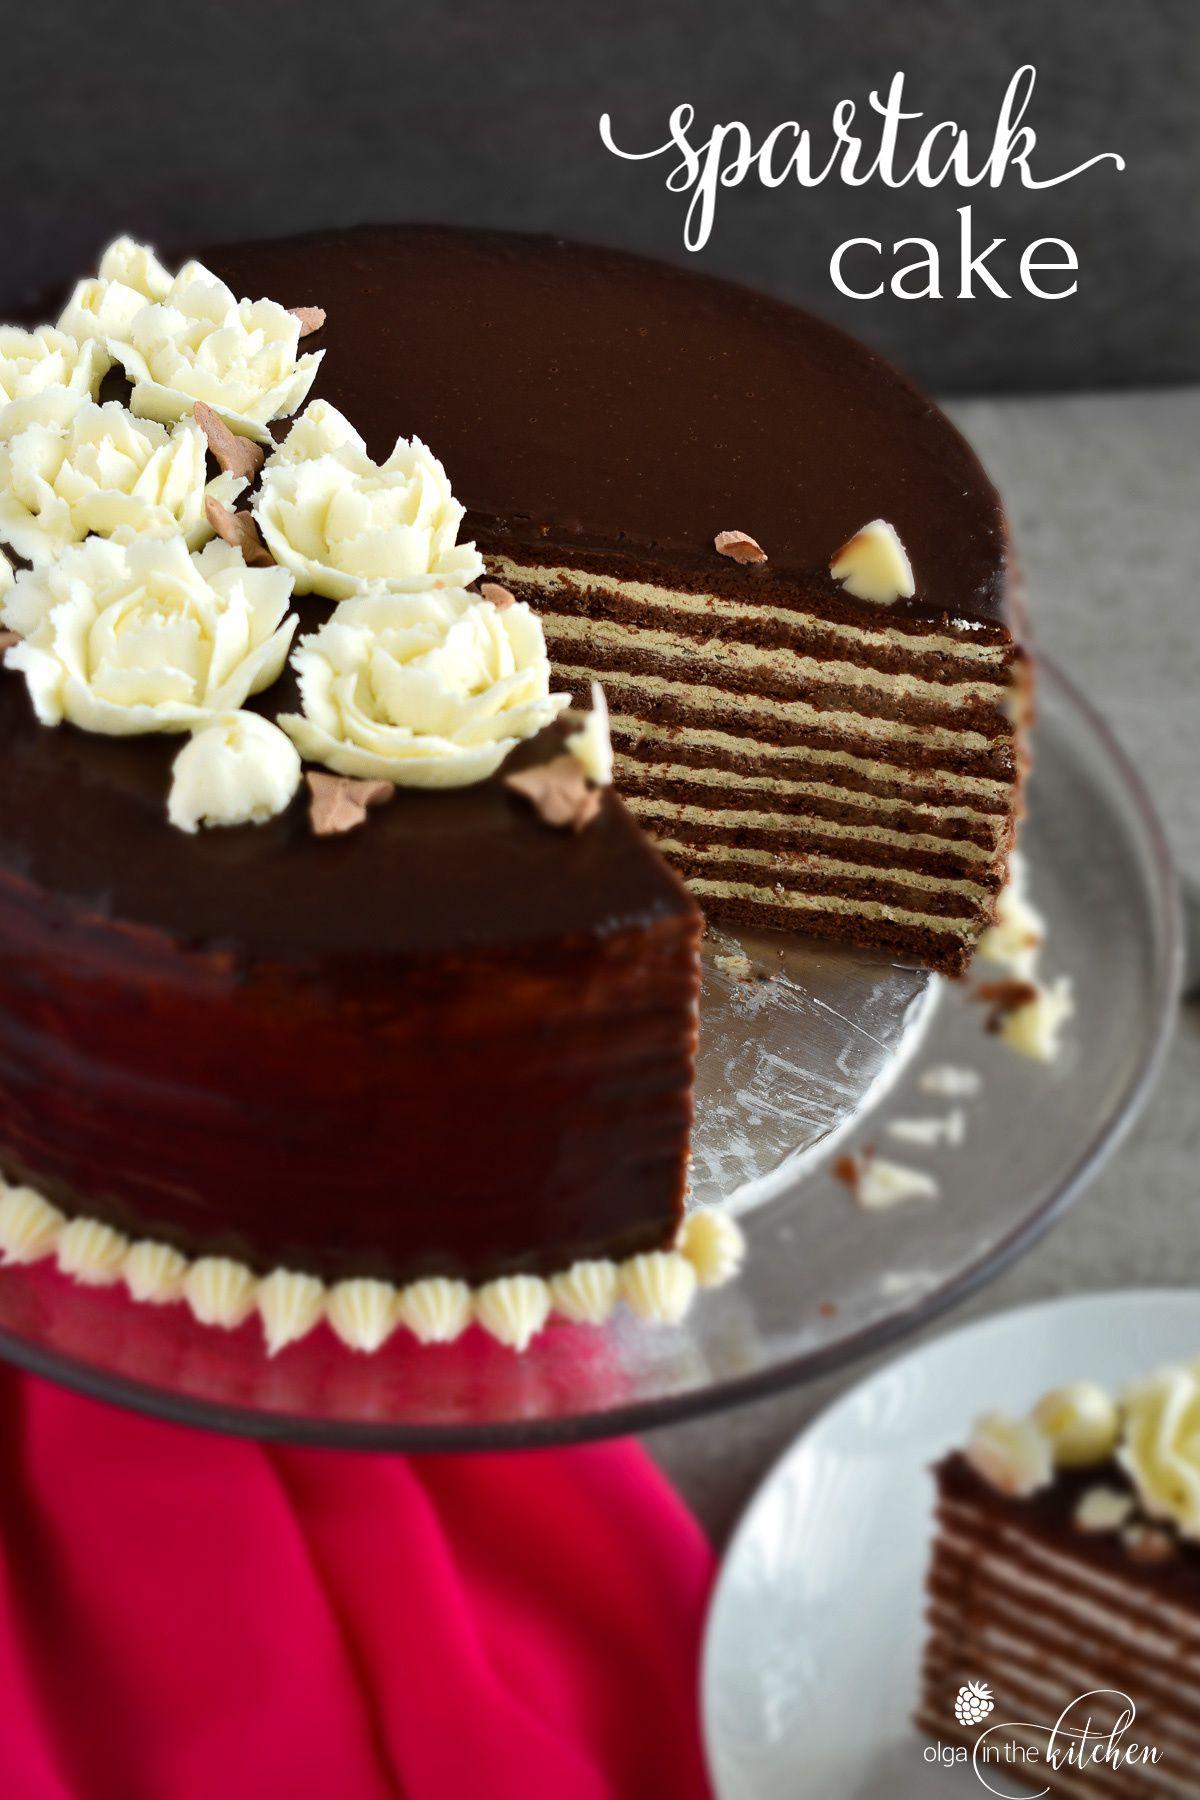 Chocolate Spartak Cake Olga In The Kitchen Recipe In 2020 Cake Sour Cream Frosting Cream Frosting